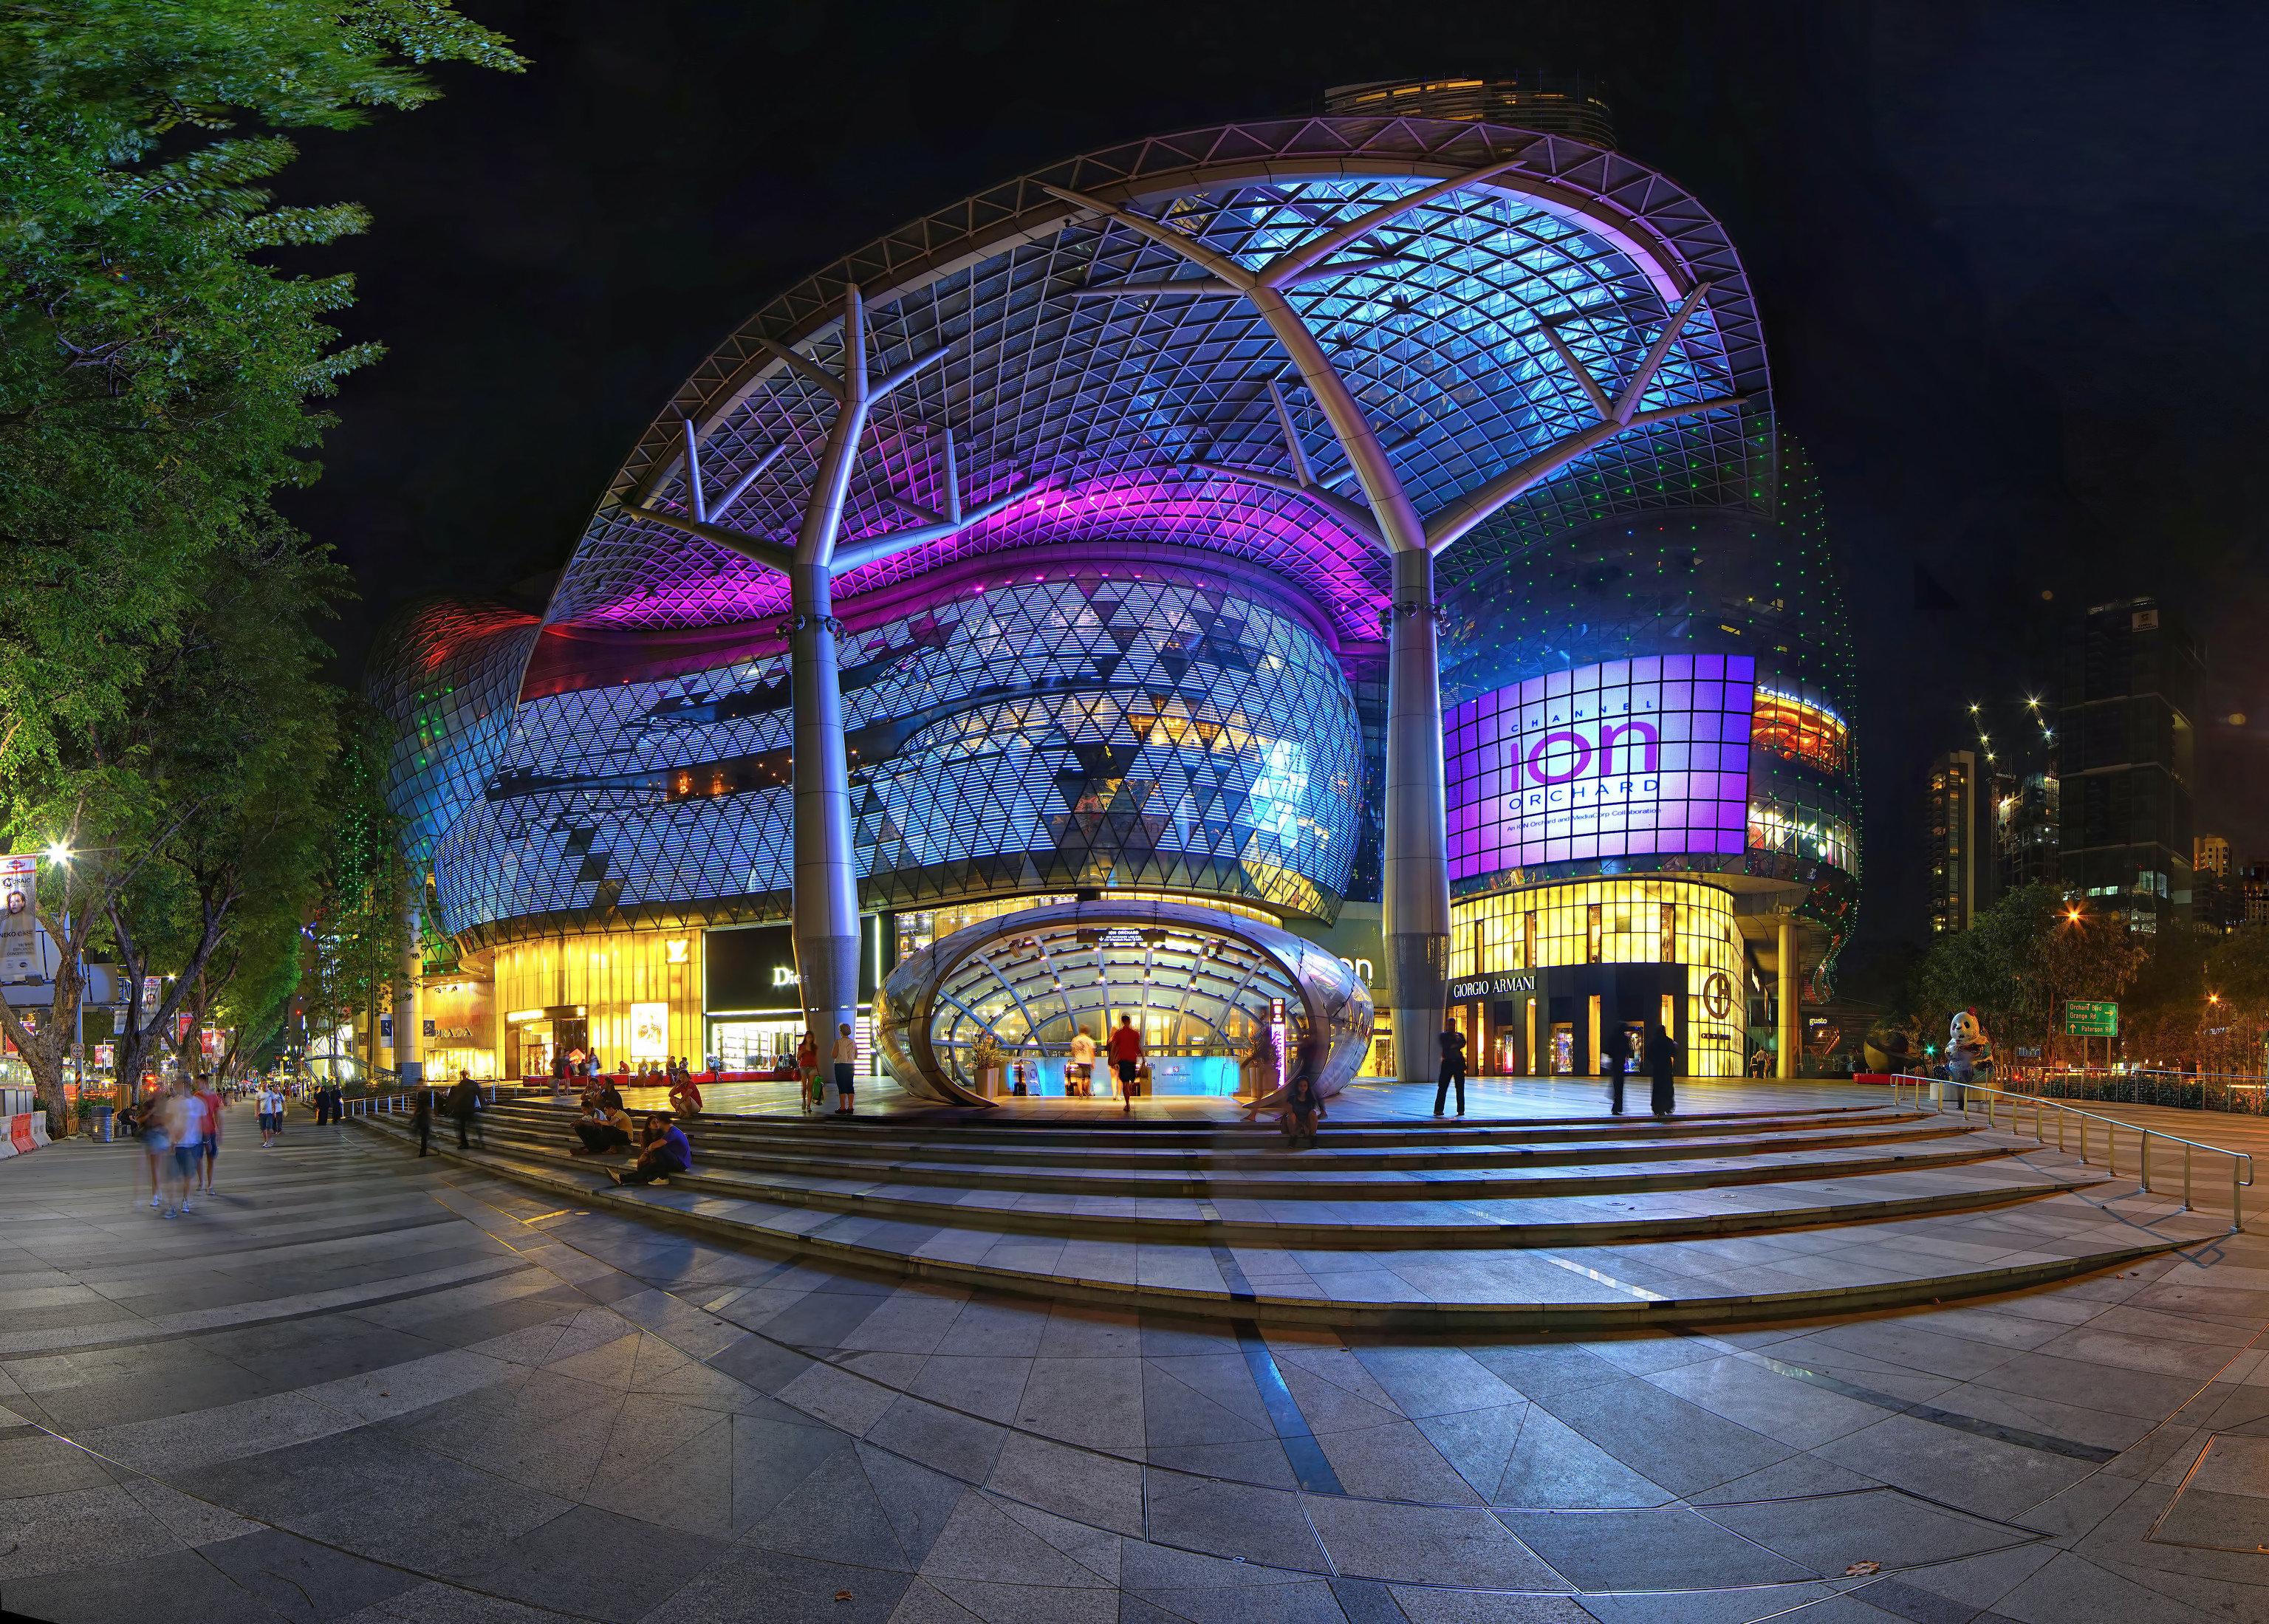 Offbeat Singapore Trip Ideas outdoor road metropolitan area night street landmark City urban area light human settlement cityscape Downtown evening lighting way colorful bright colored